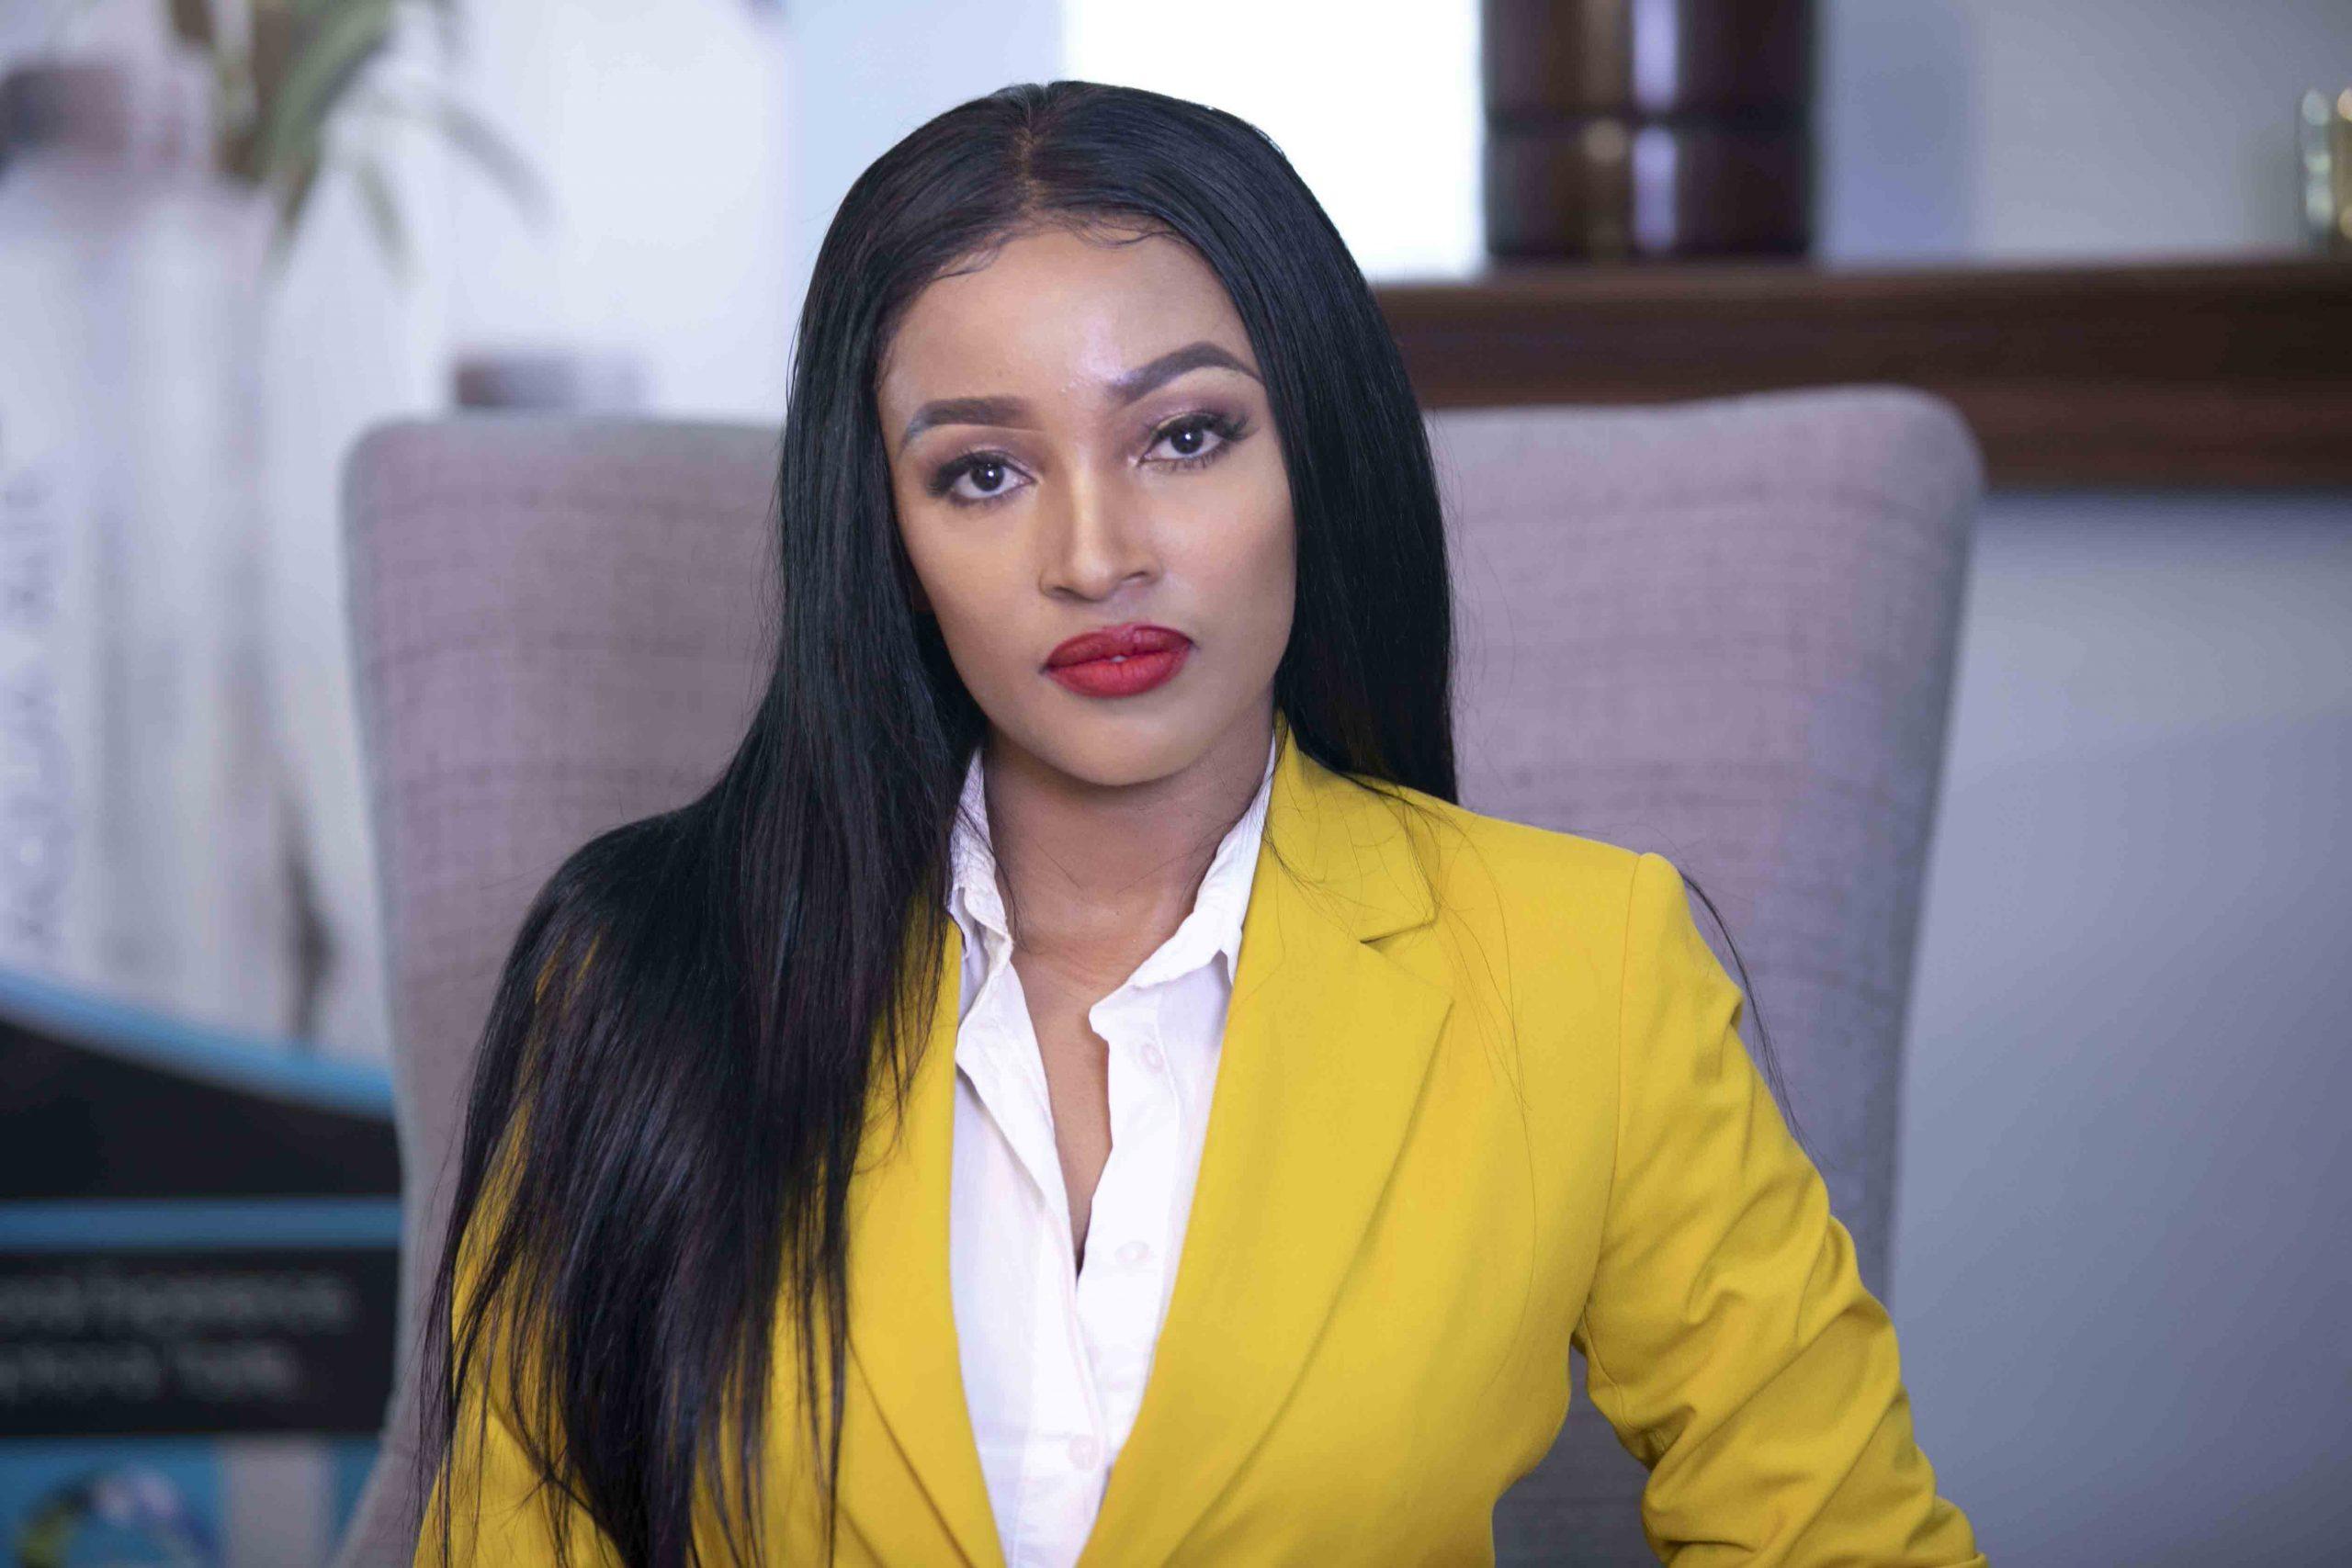 Keamogetswe Matsho - She Brigade Podcast Interview